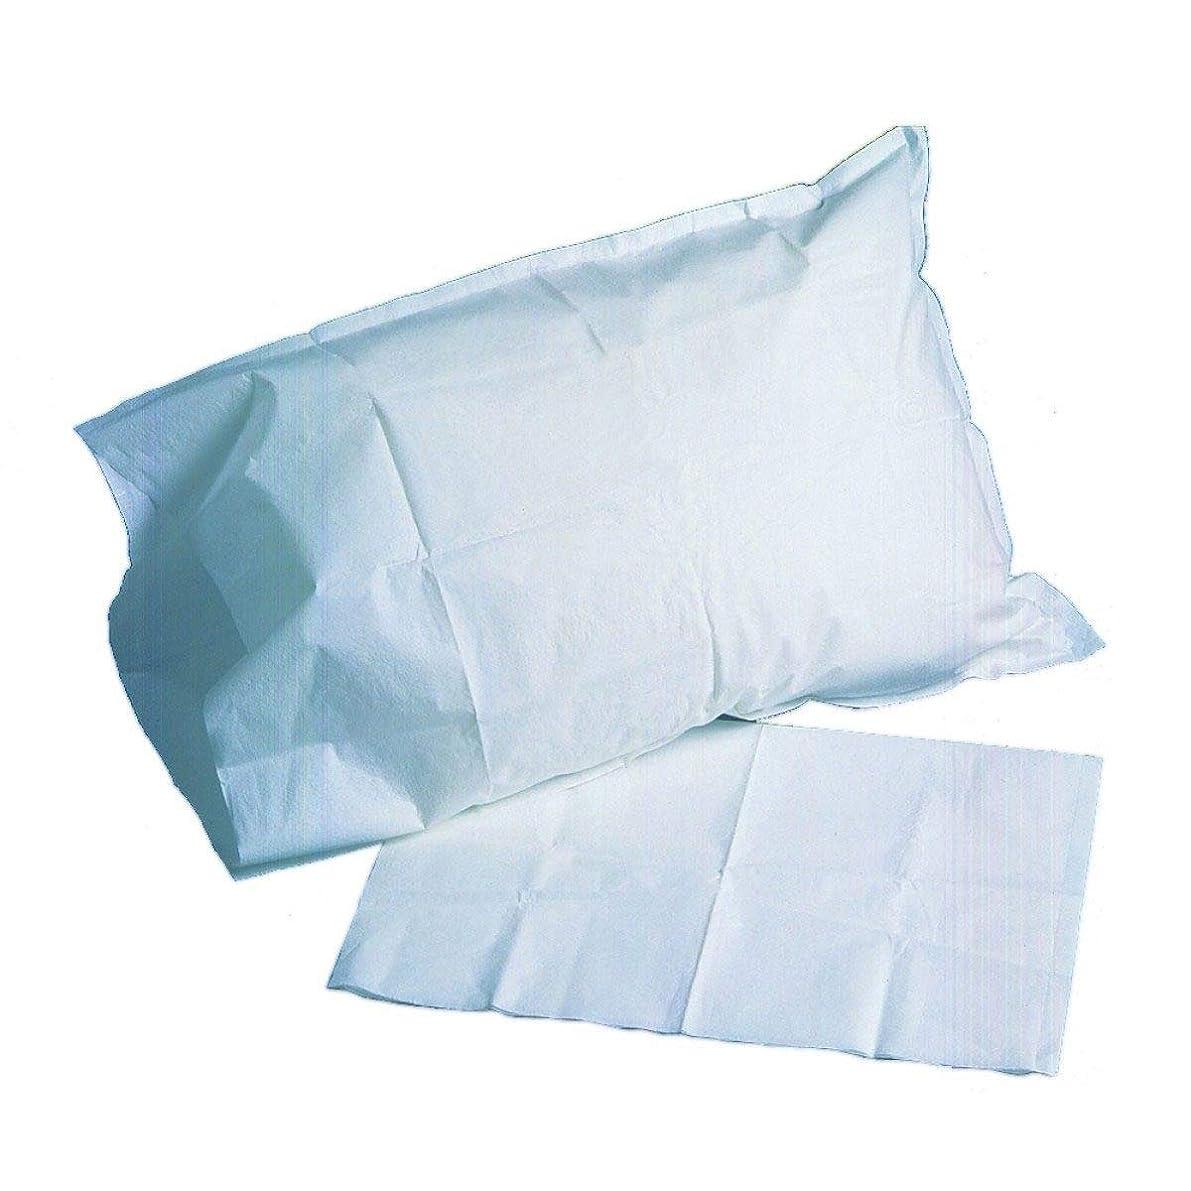 McKesson 18-918 Pillowcase, Tissue/Poly, Blue, 21